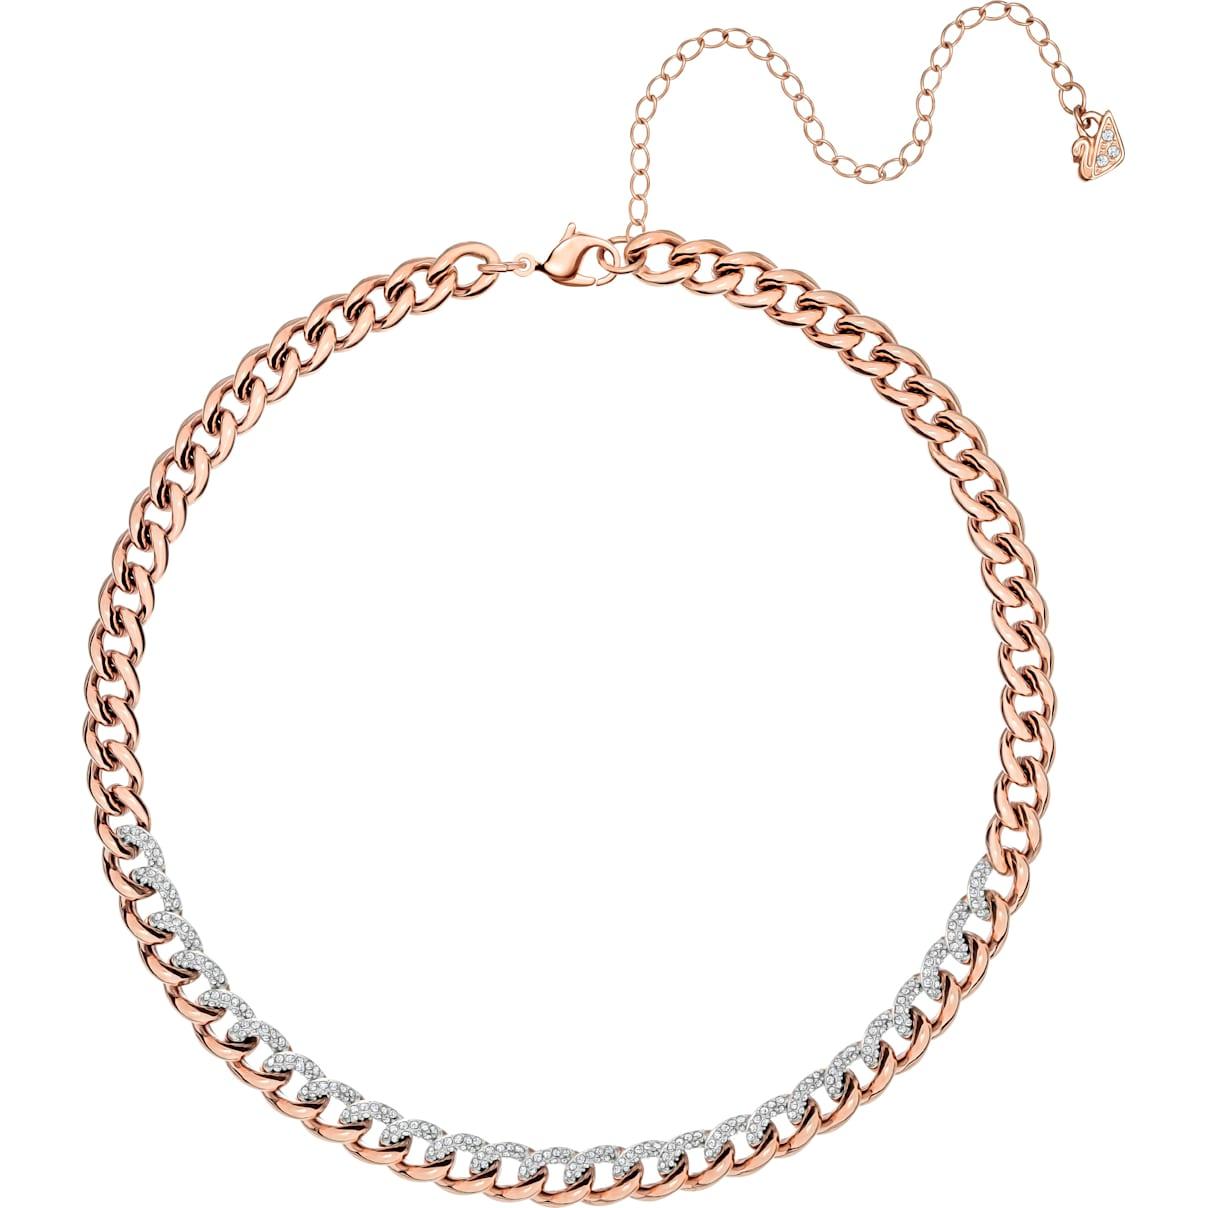 Swarovski Lane Necklace, White, Rose-gold tone plated